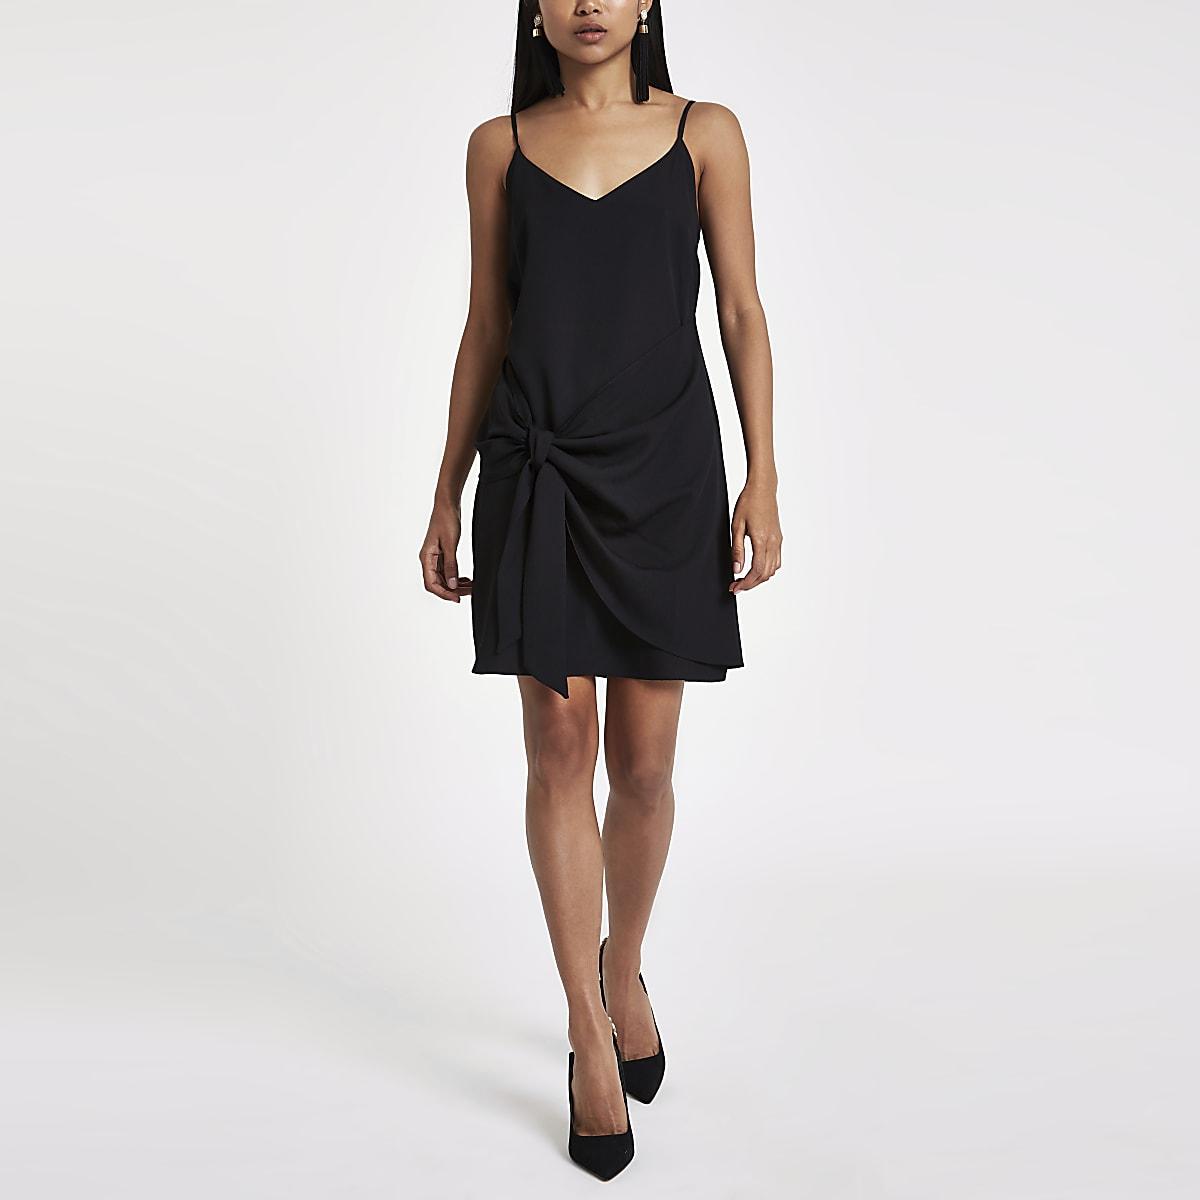 Petite black tie front cami slip dress